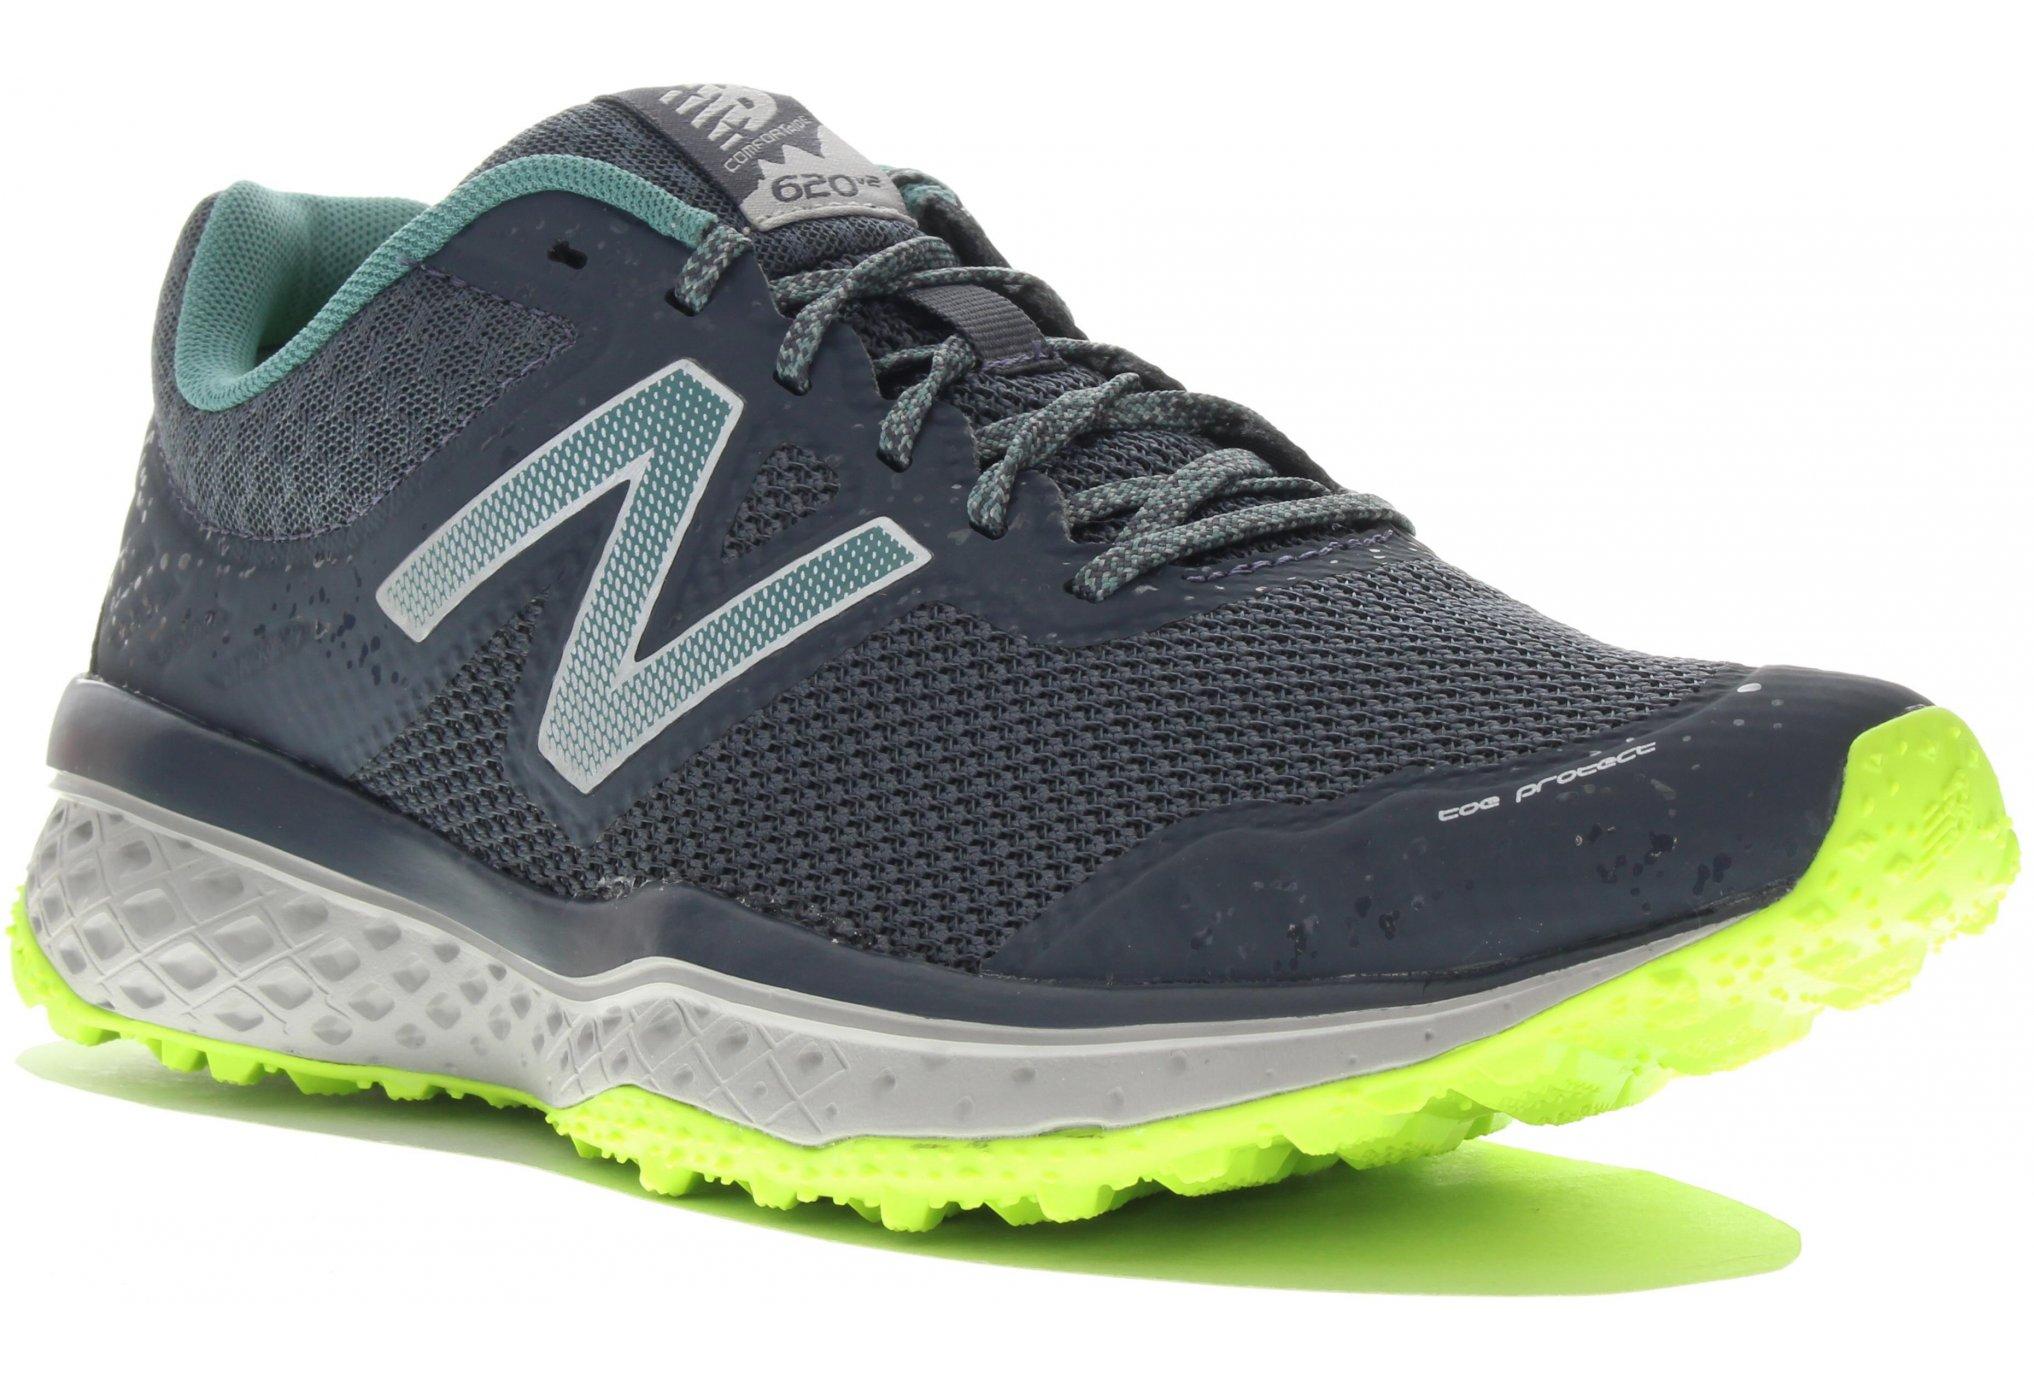 New balance wt620 v2 b chaussures running femme